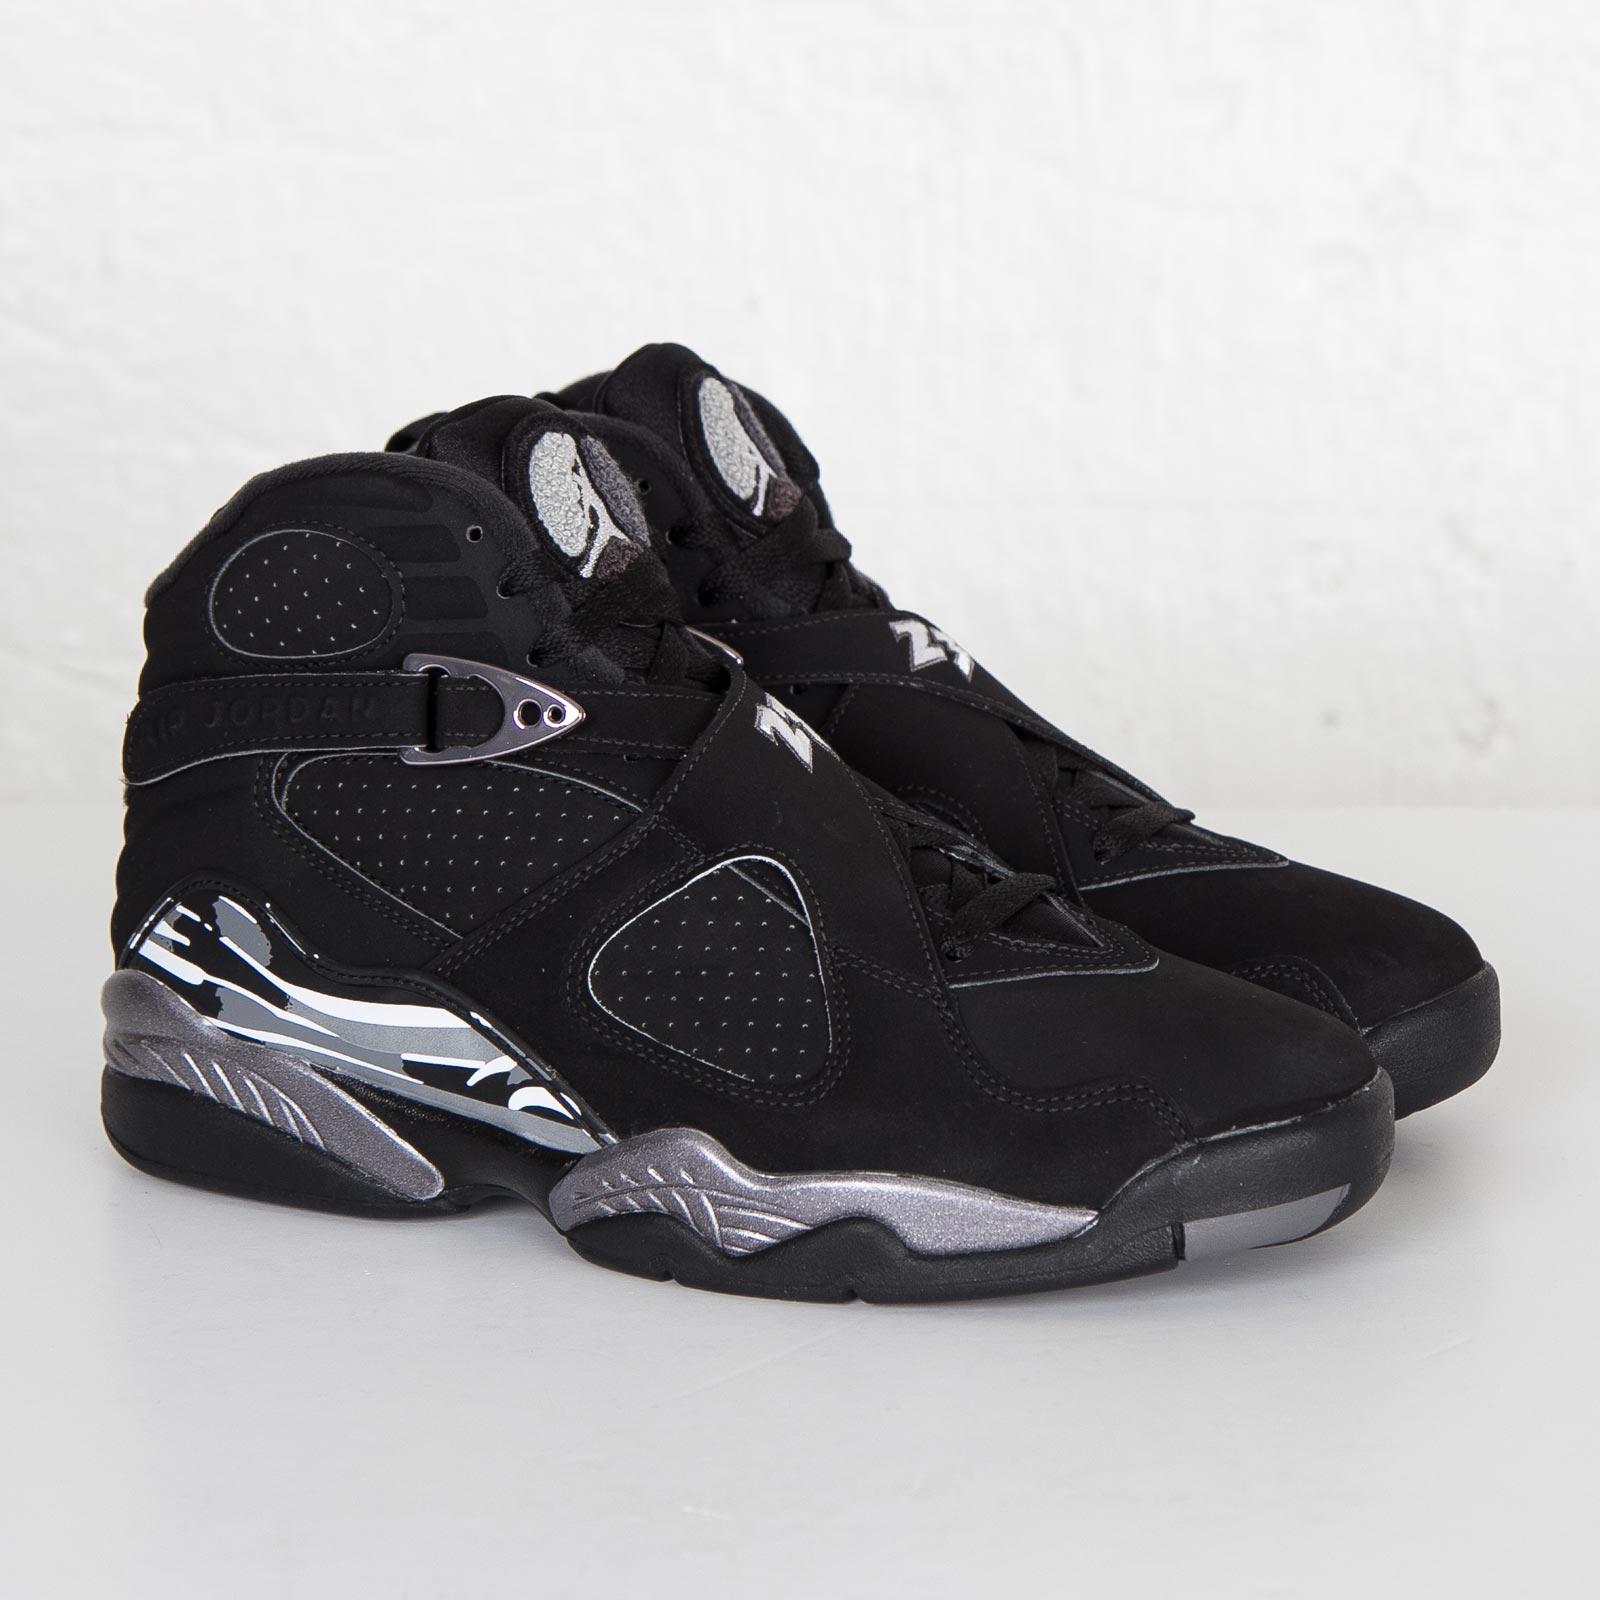 online store fc827 15d2f Jordan Brand Air Jordan 8 Retro